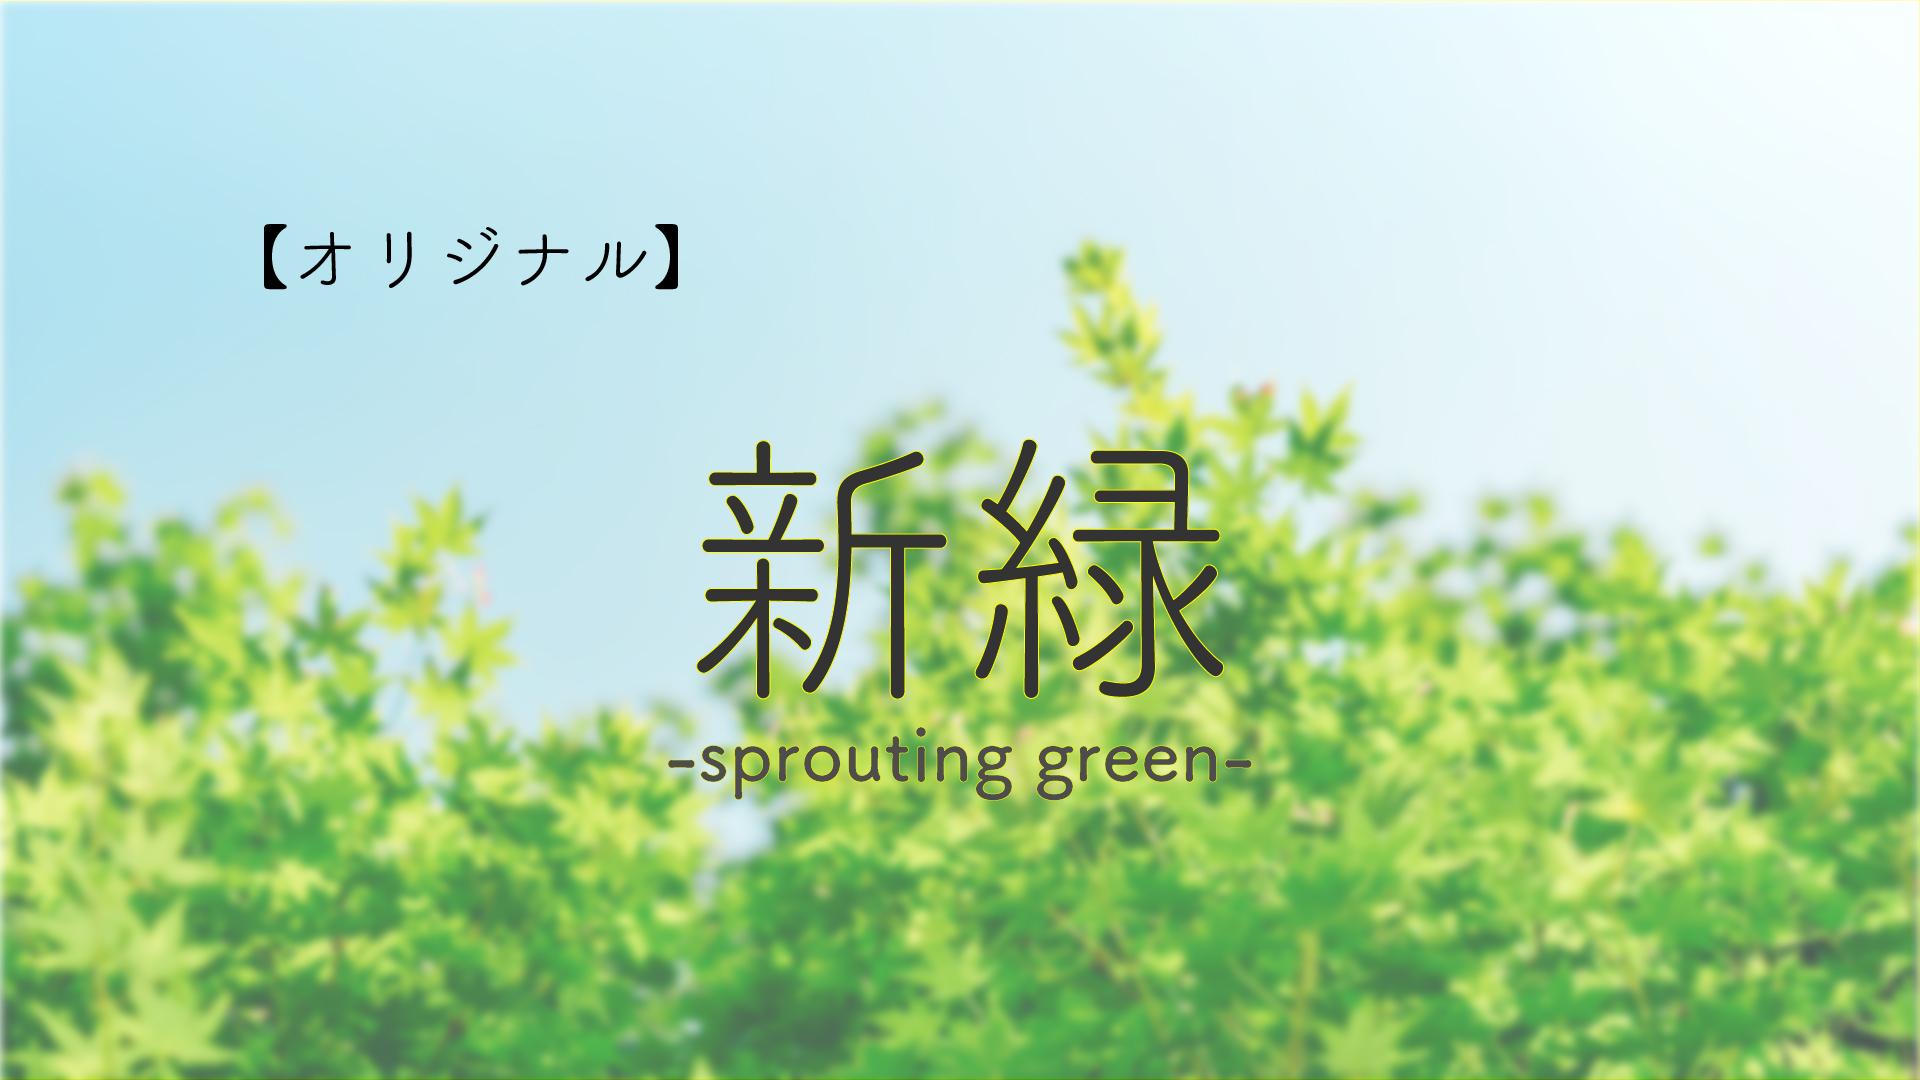 sumnail_sproutinggreen